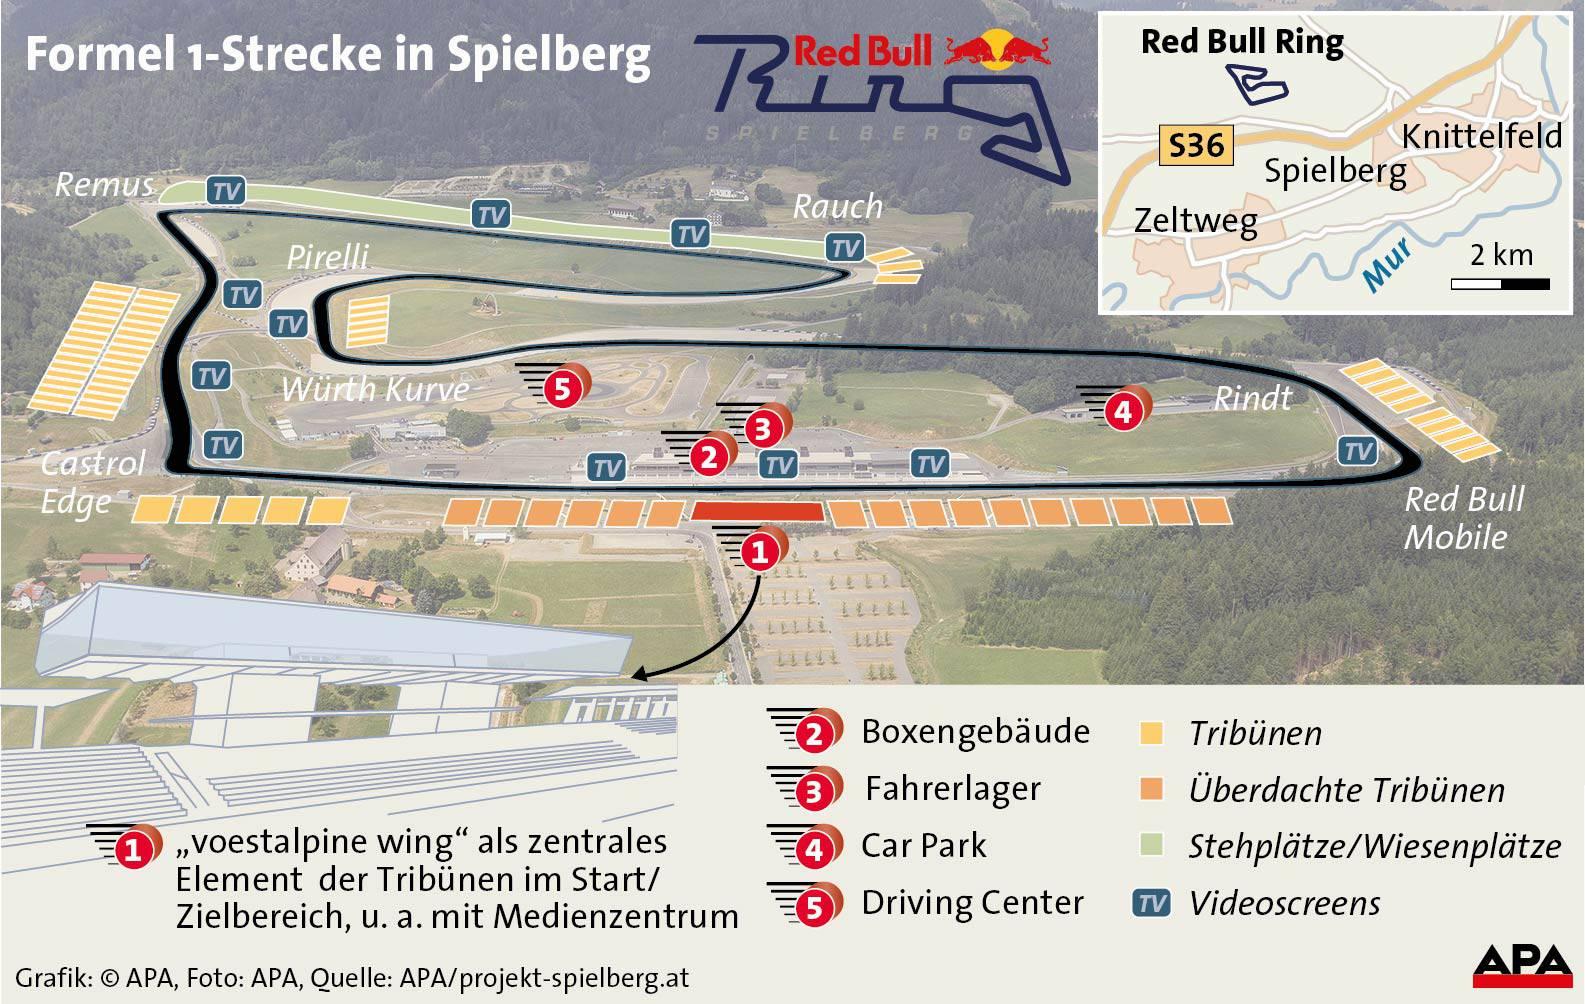 _Formel 1 Strecke in Spielbe... - APA-InfoGrafiken - 17.06.14 - 12.08 - AGD0005 - High-Res